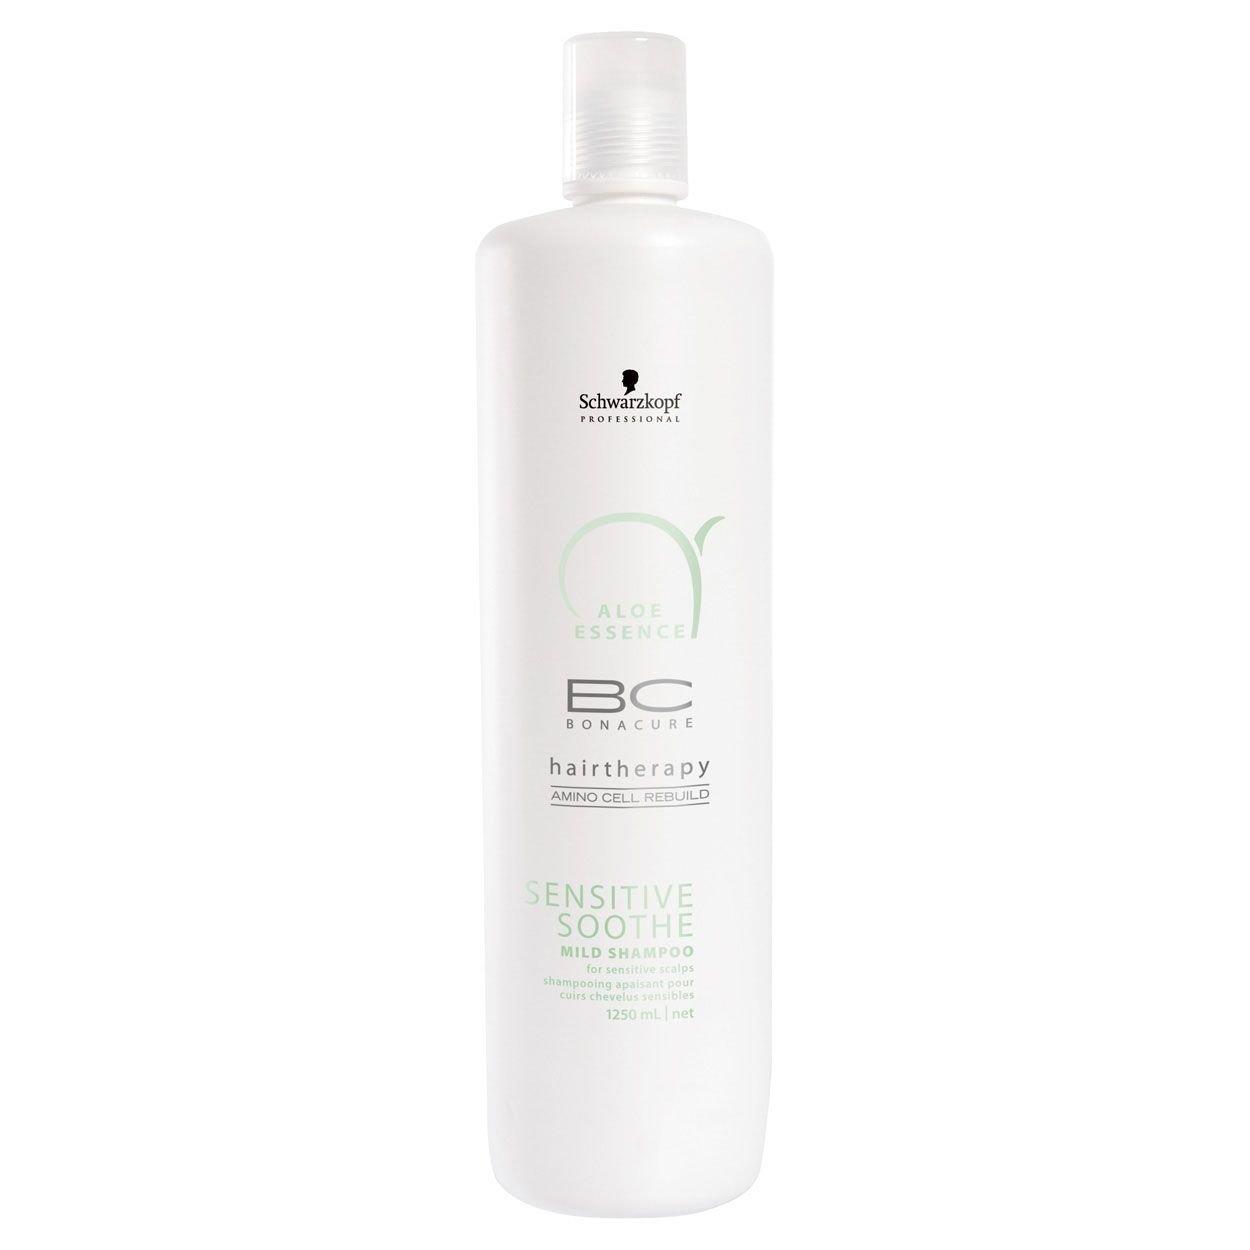 Schwarzkopf BC Bonacure Sensitive Soothe Cosmetic 1250ml